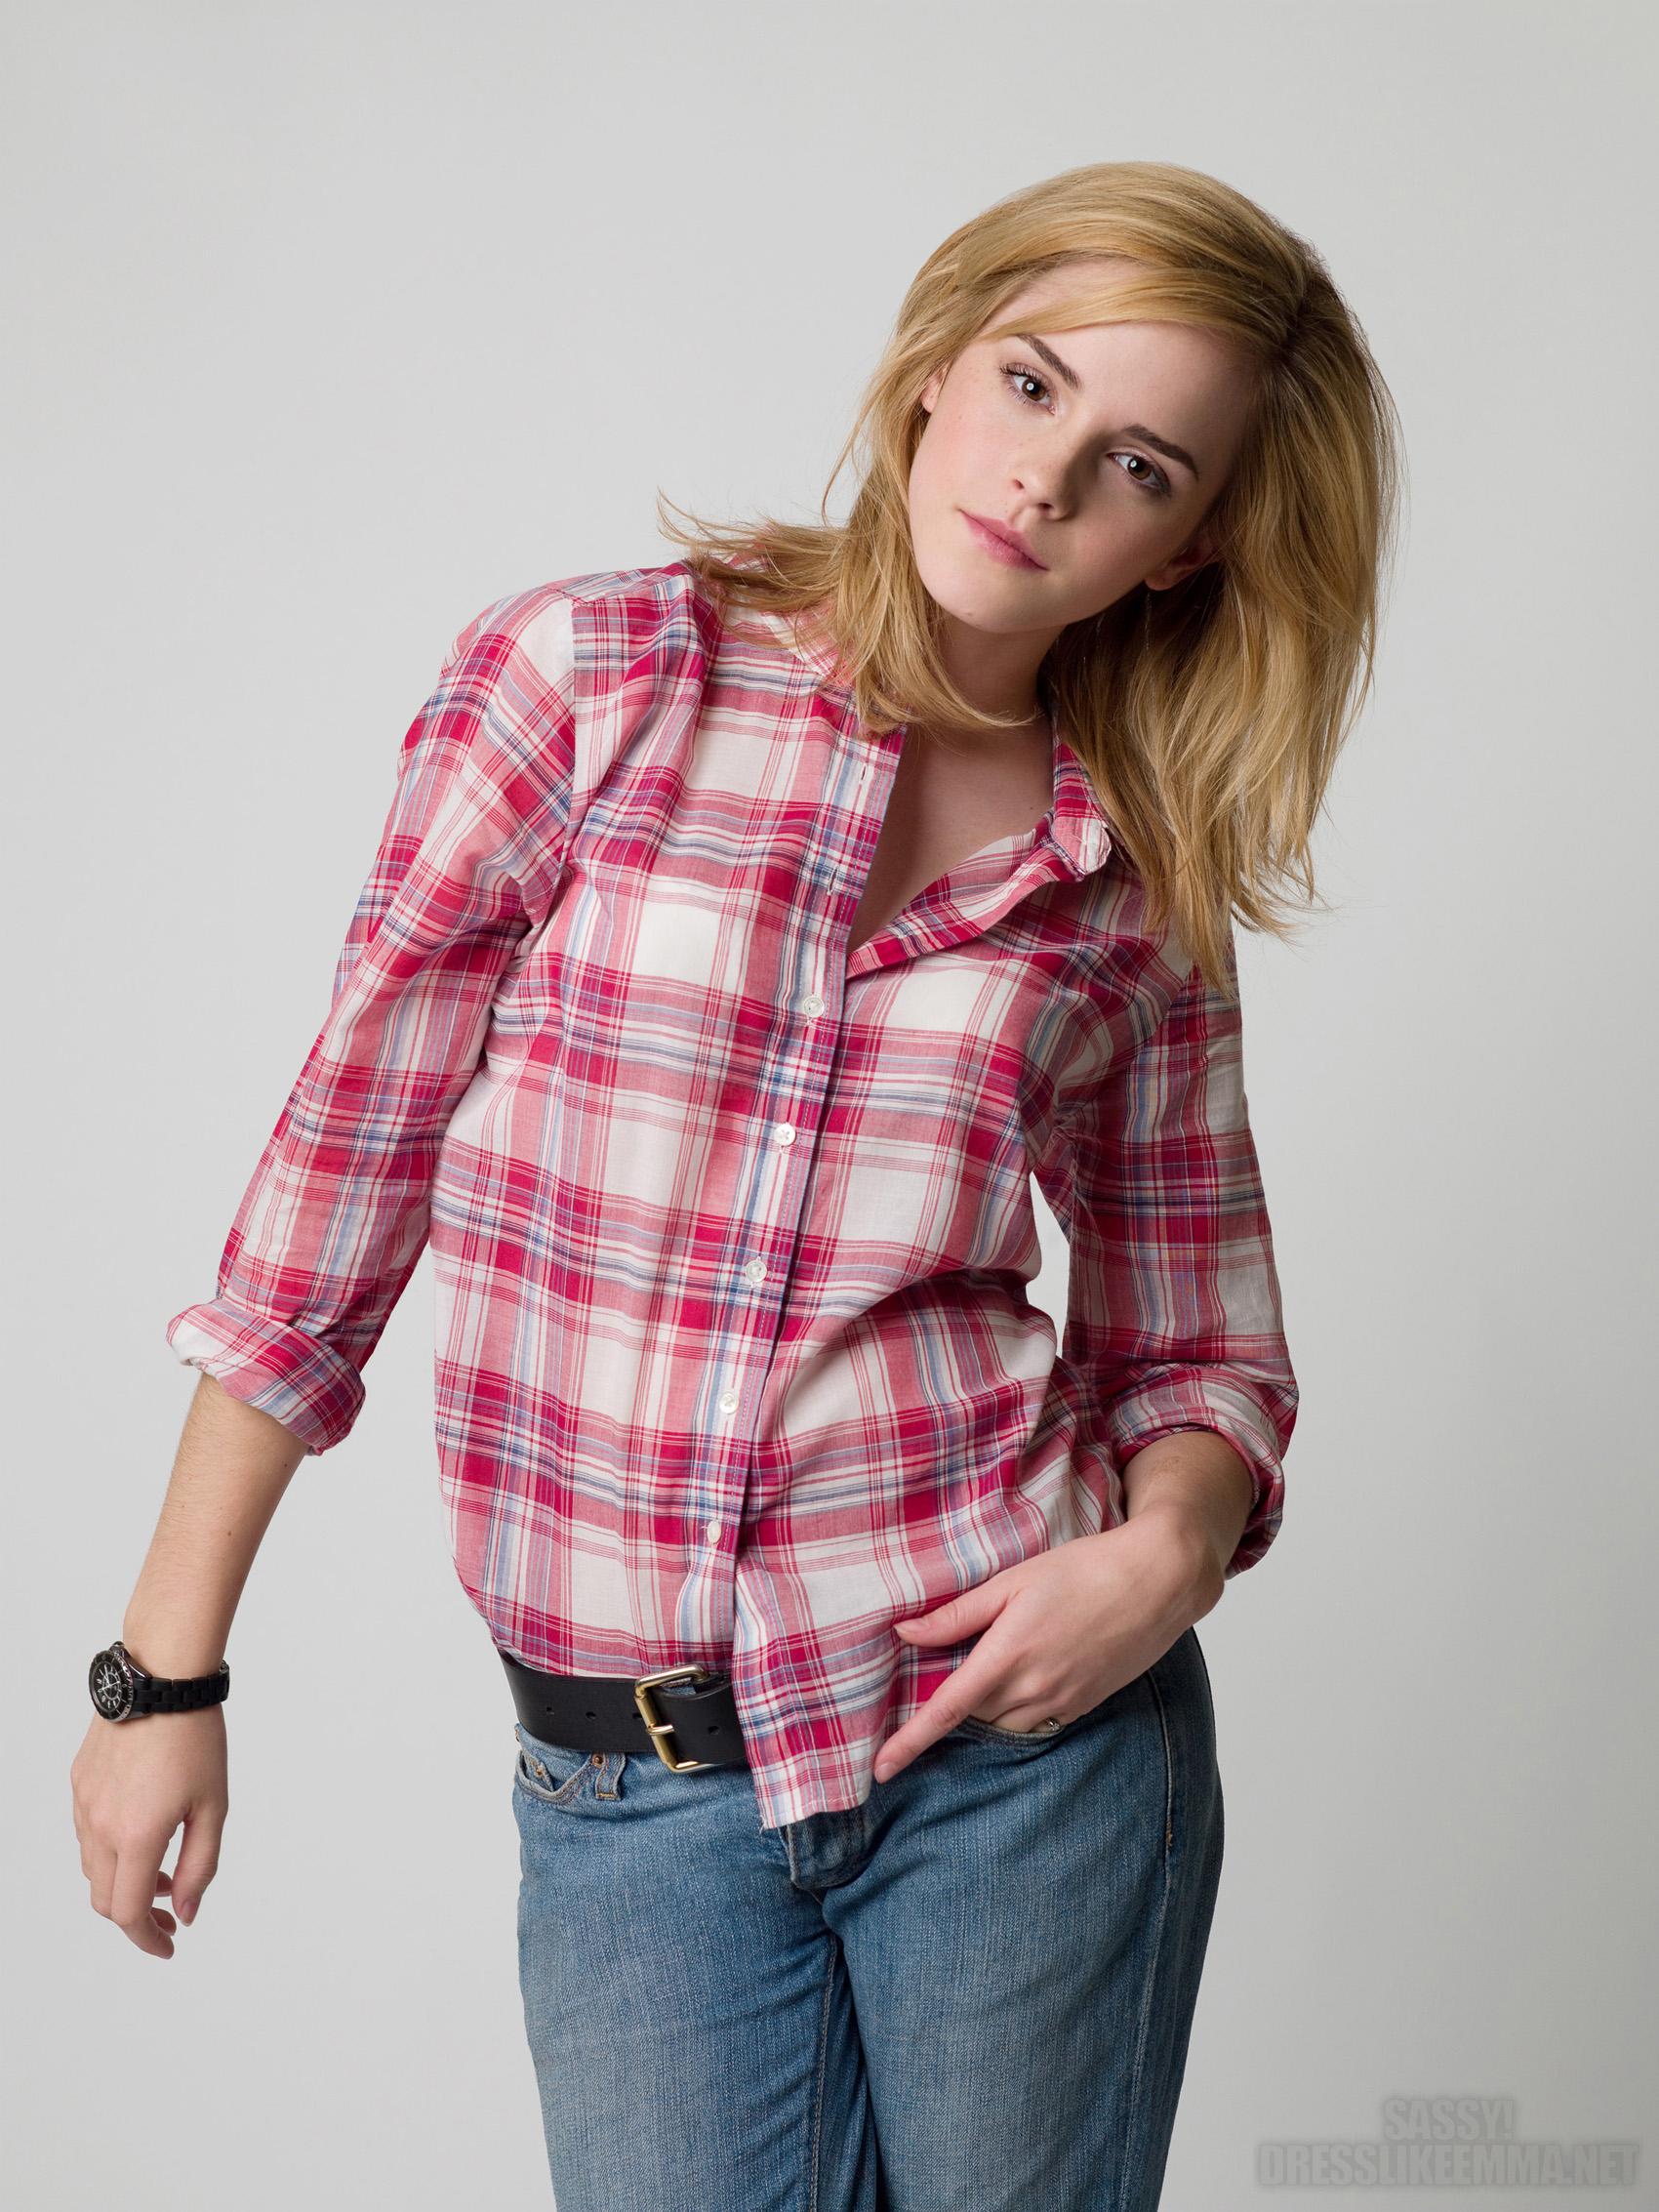 Club de Fans se Emma Watson Ellegirl01